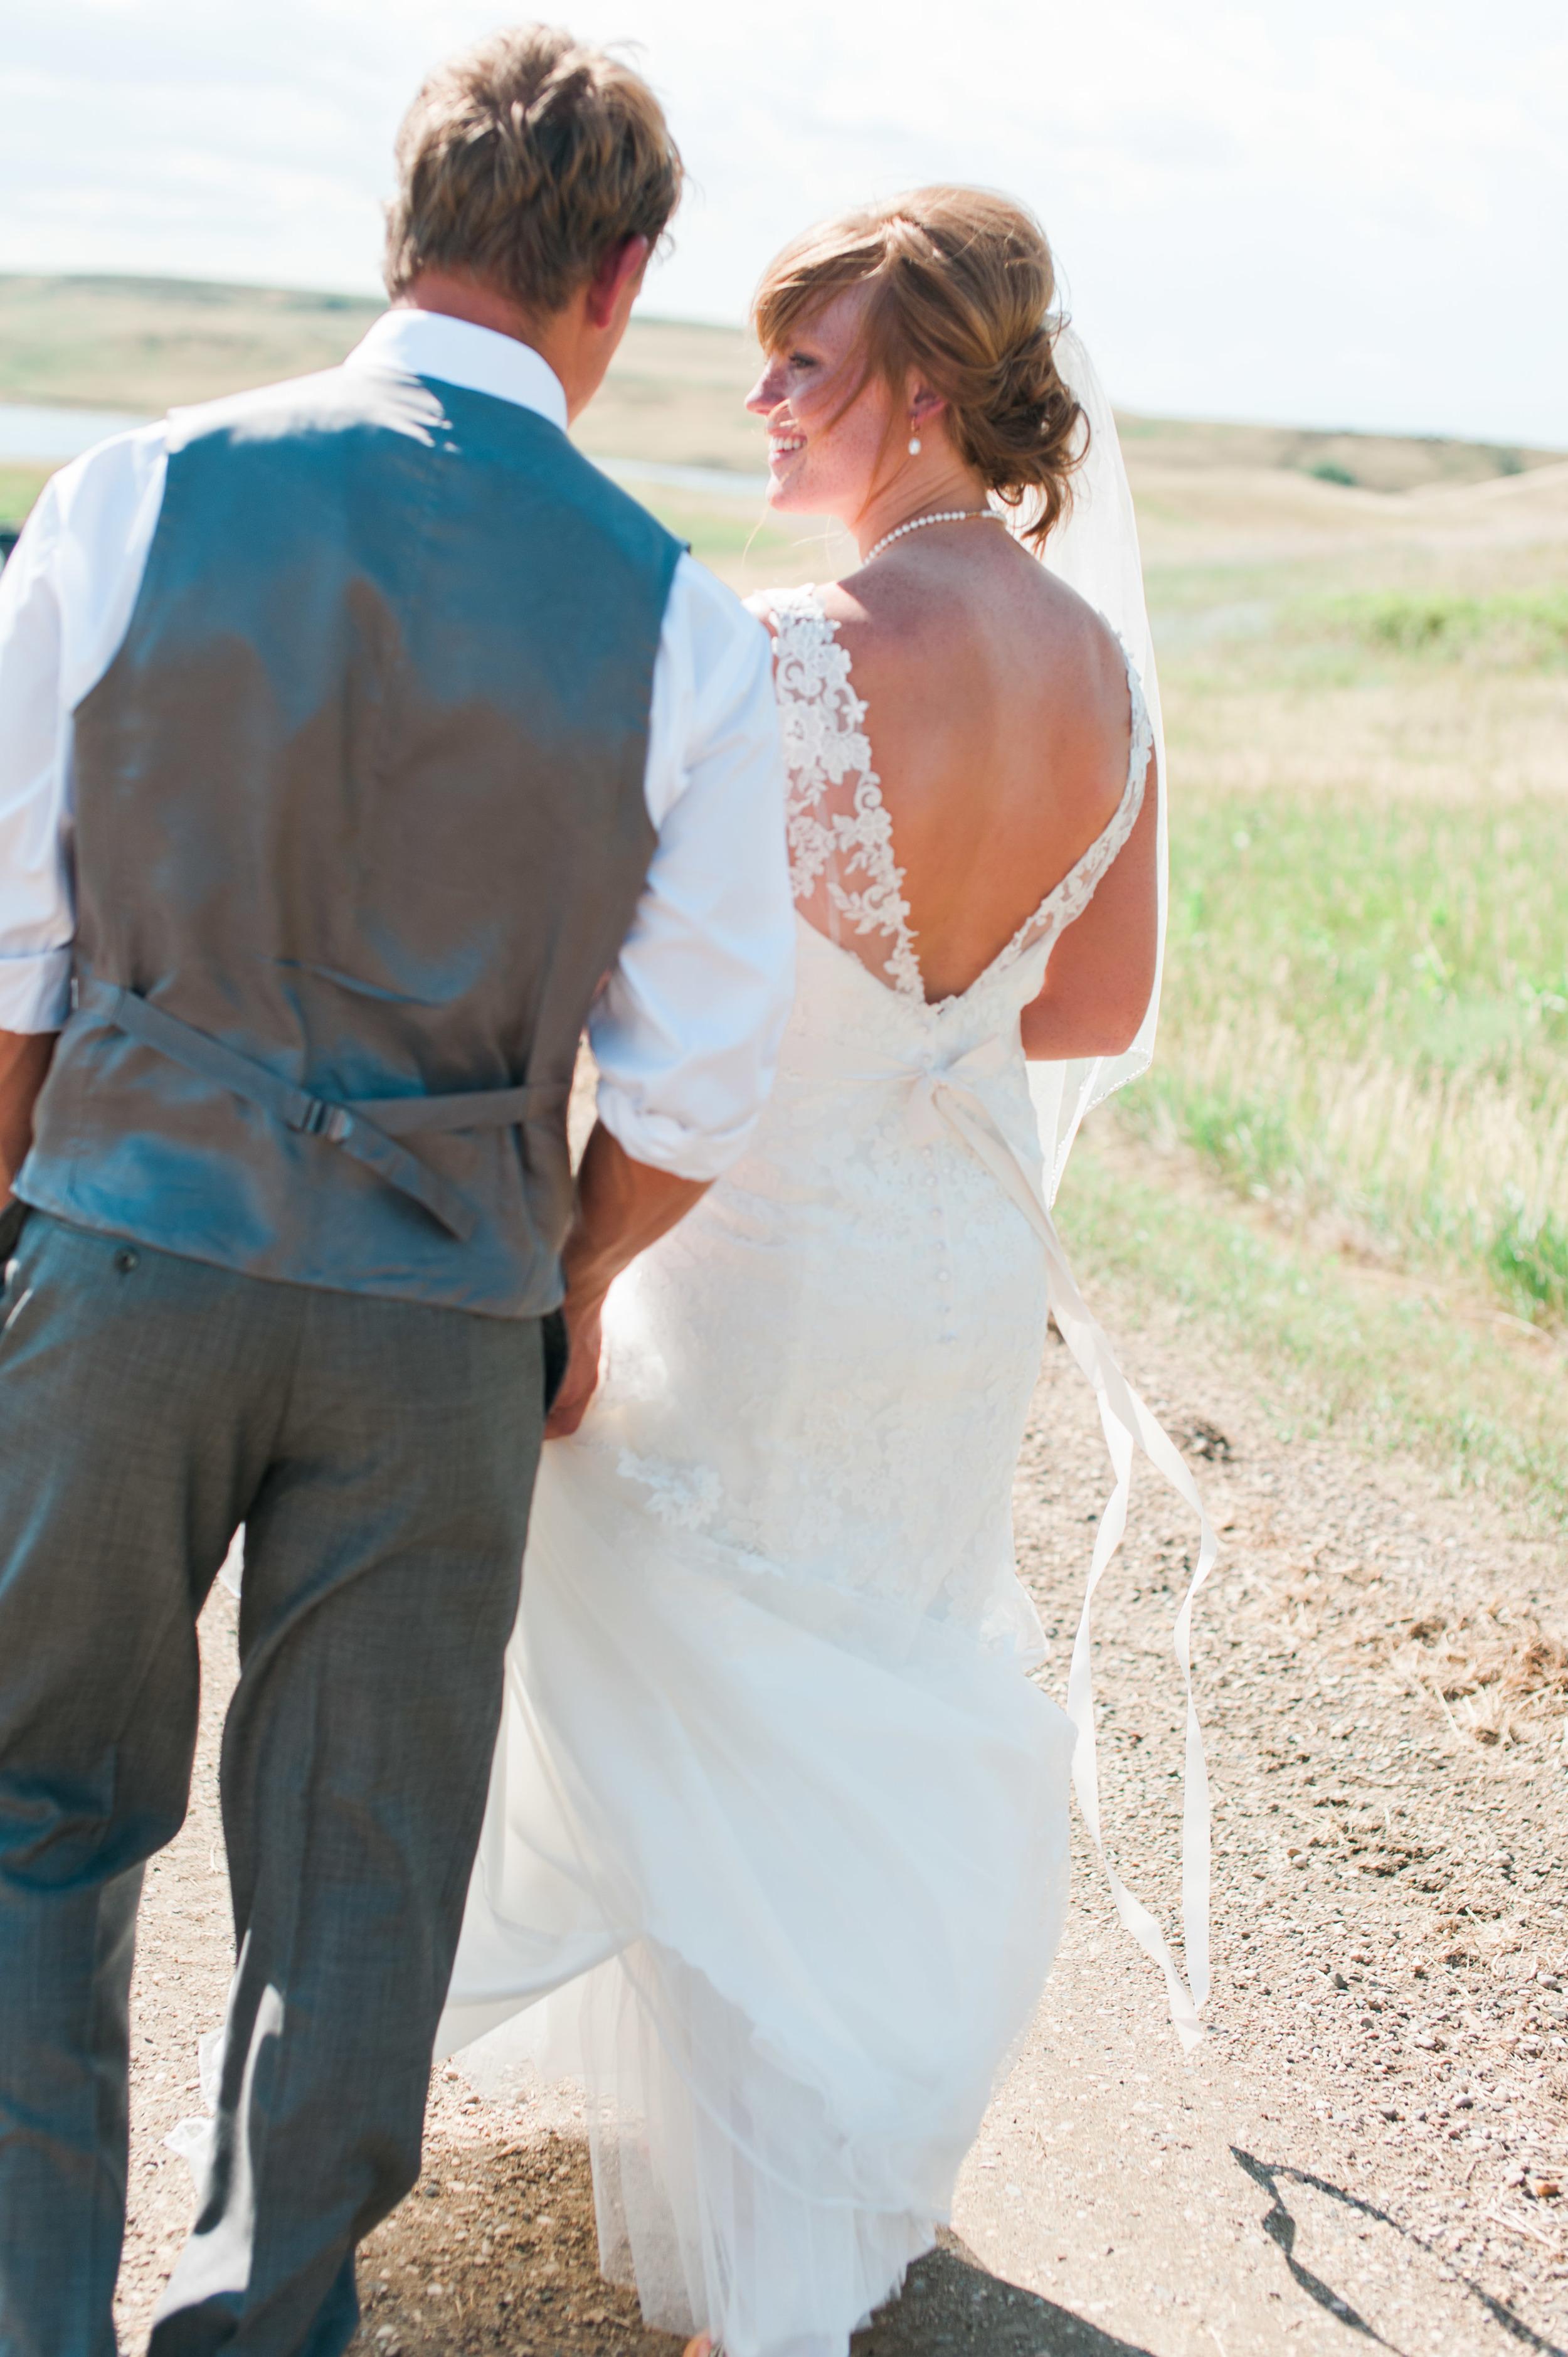 wedding-photography-18.jpg